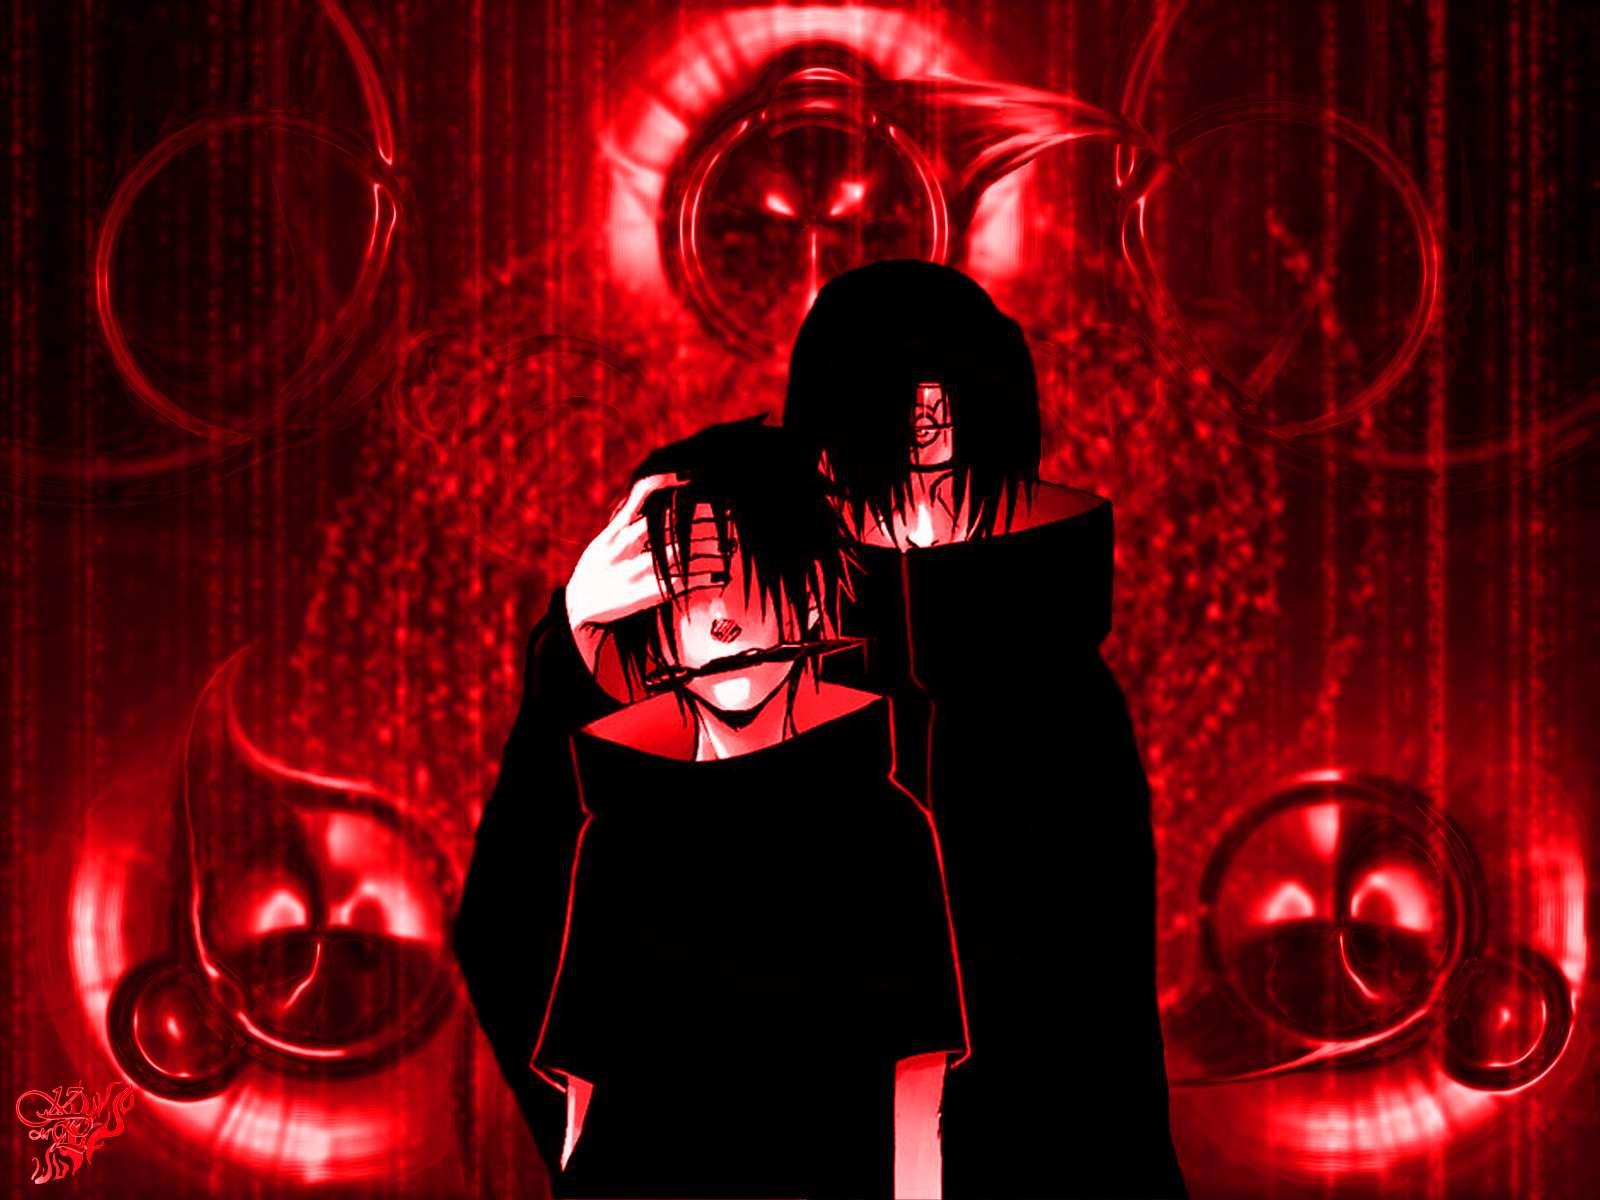 Anime Desktop Icon,Anime Desktop Gadgets,Anime Desktop Mascot,Anime Desktop Pics